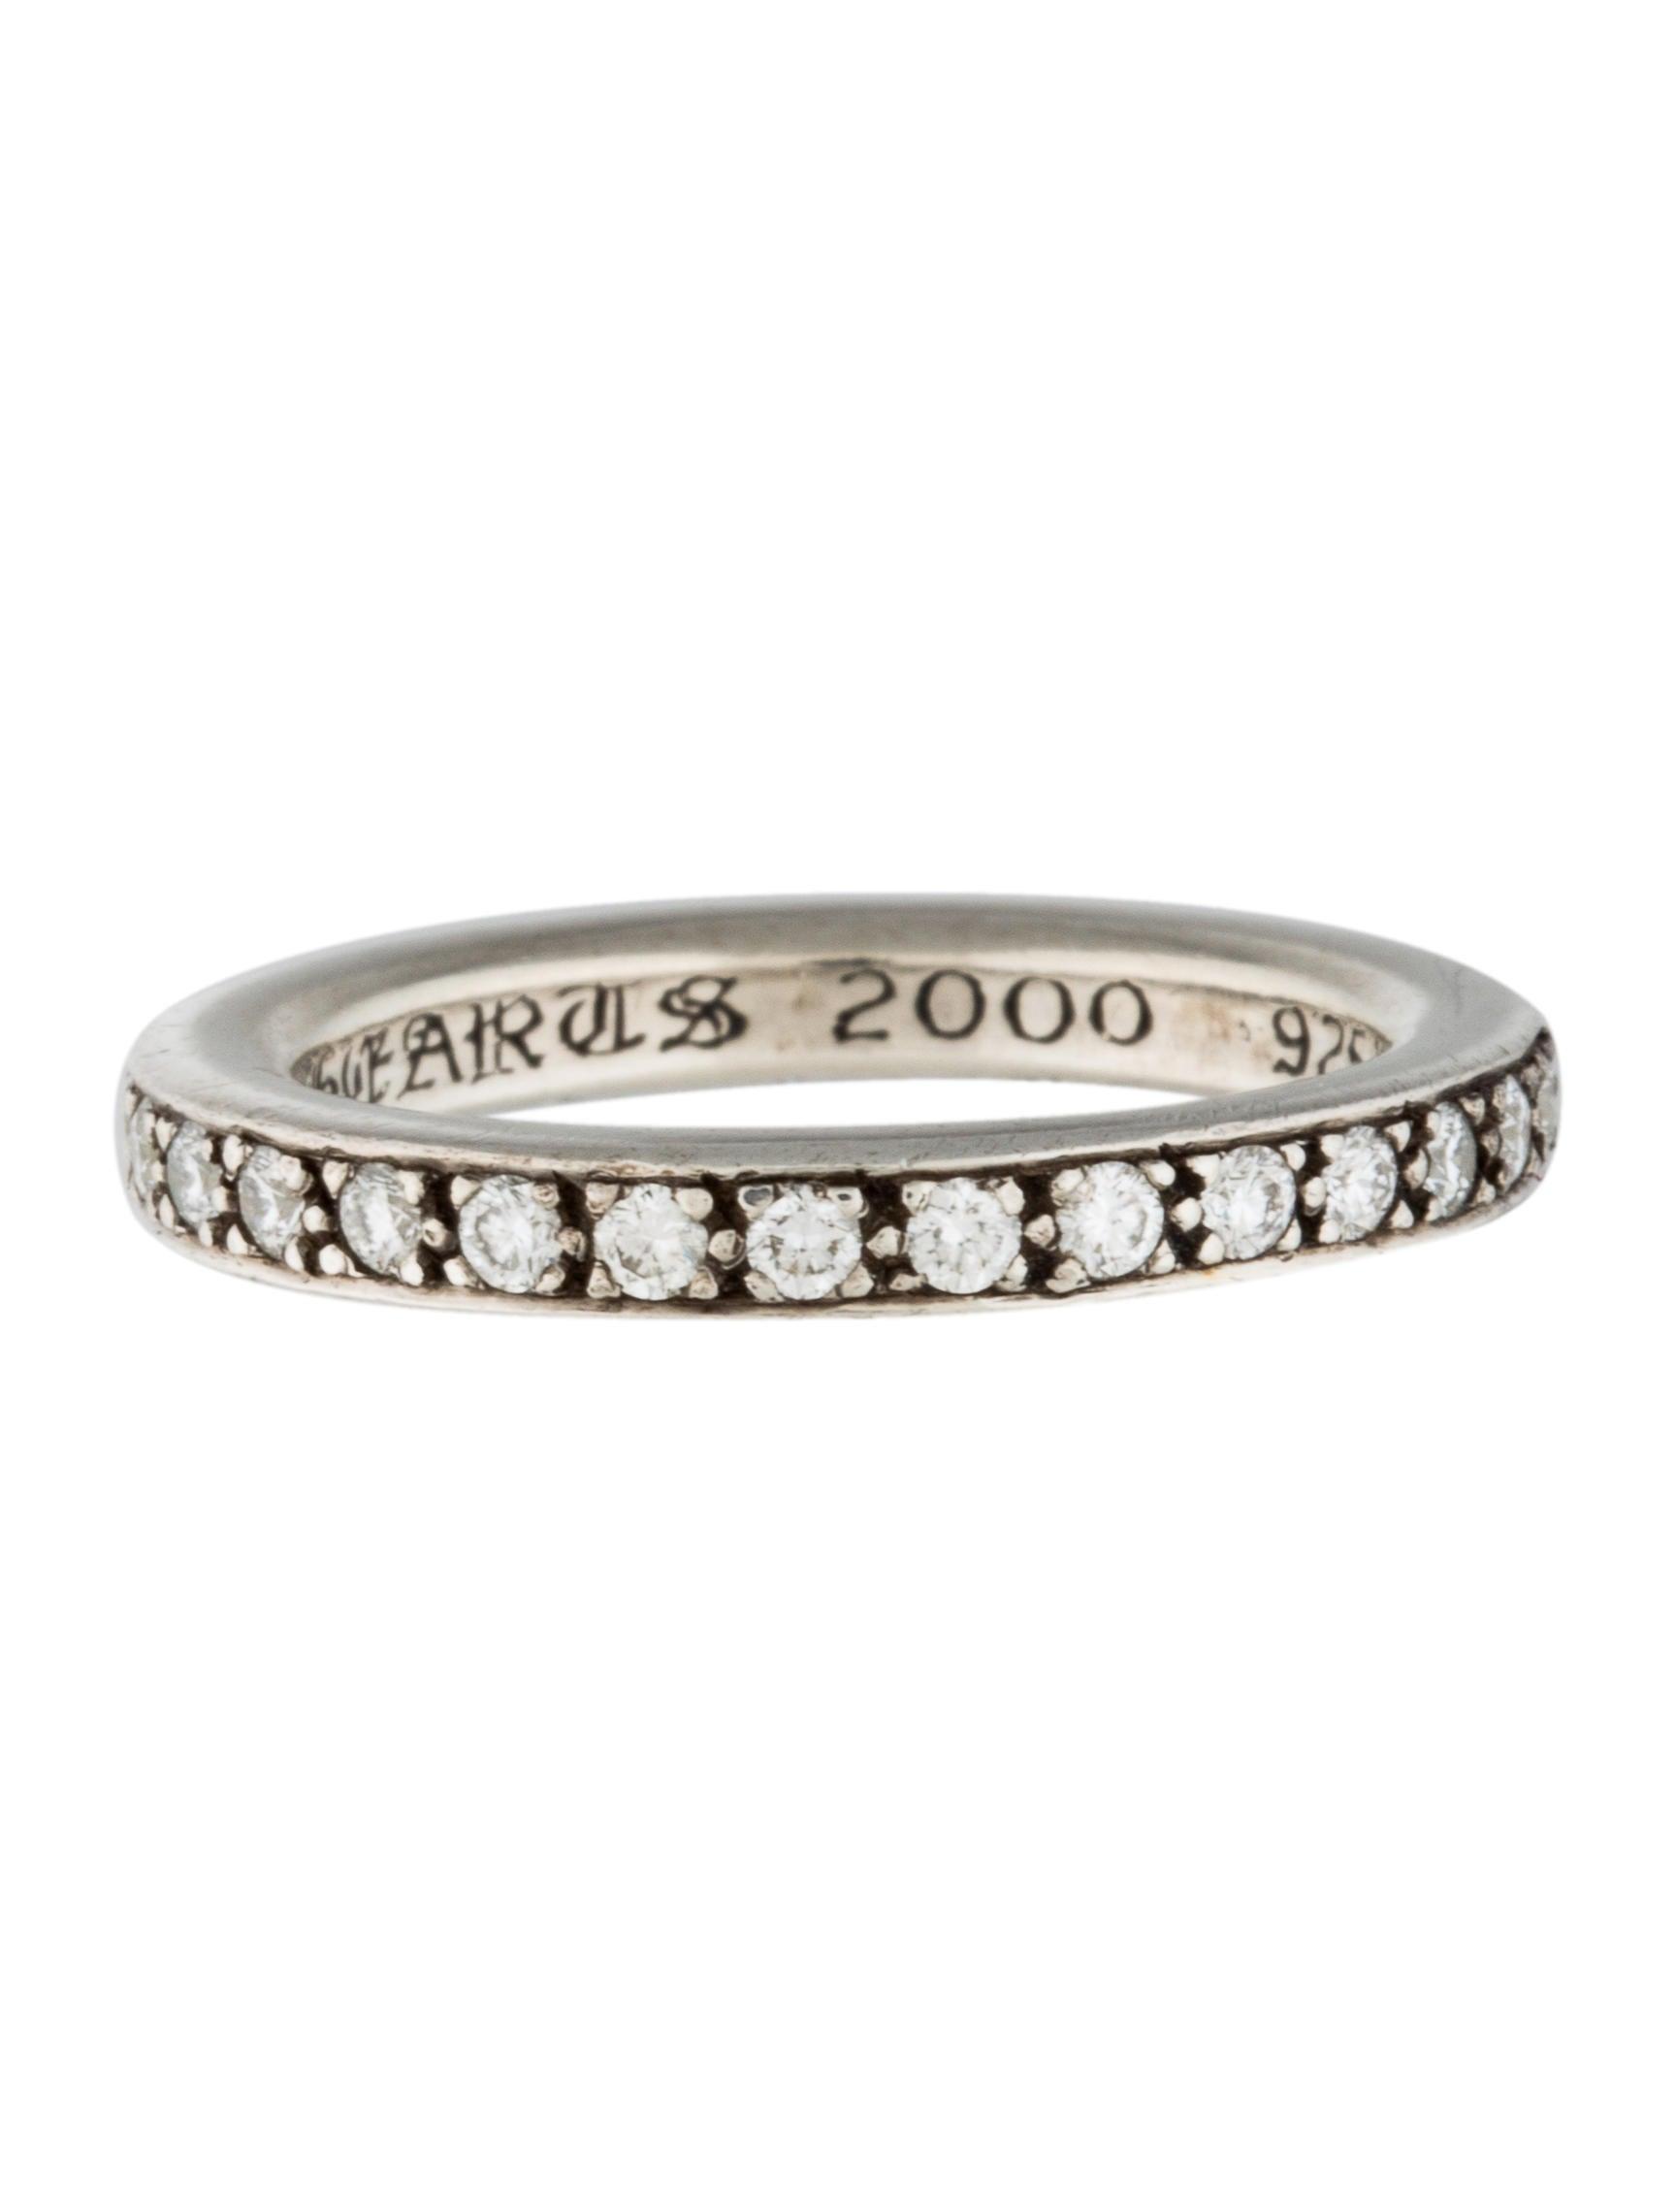 f01b25225335 Chrome Hearts Diamond TFL Eternity Band - Rings - CHH21089